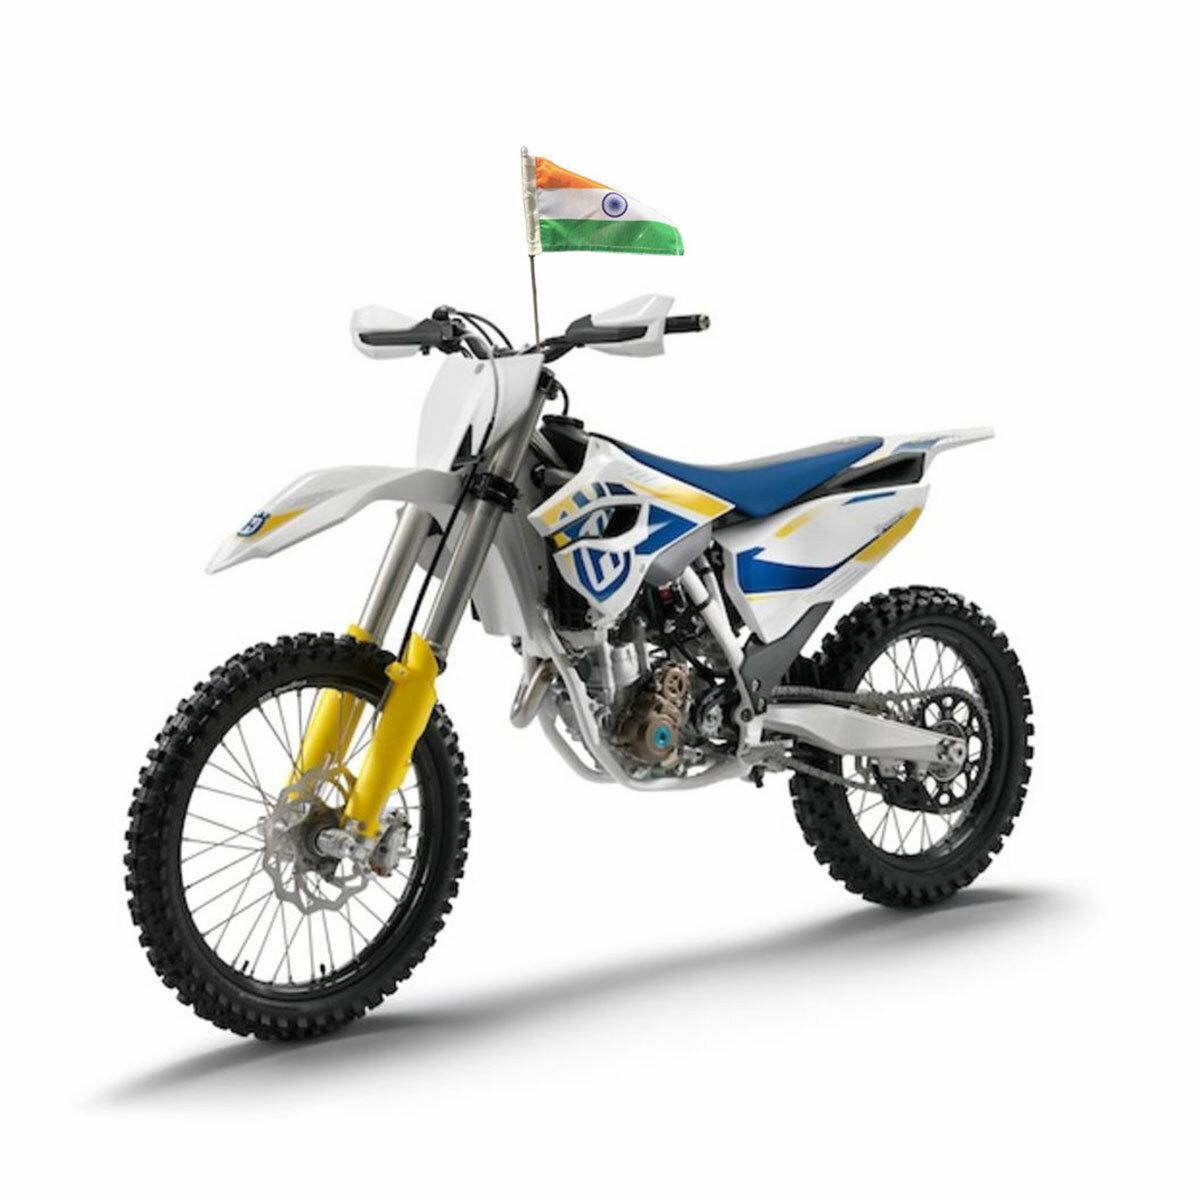 Durable Indian Flag Mounted On A Bike / Motorbike